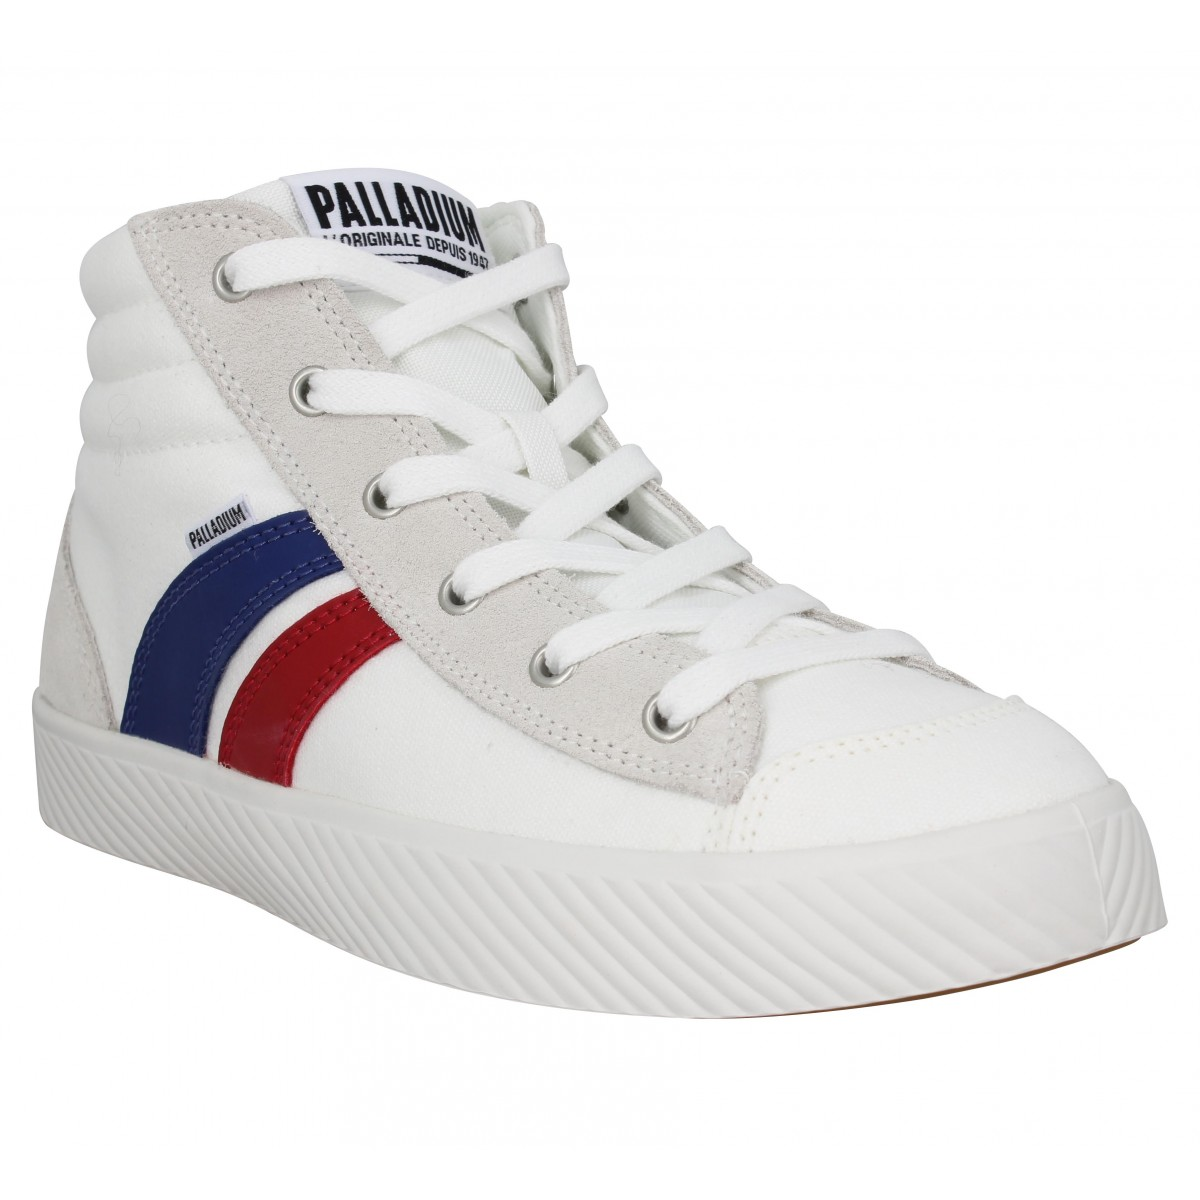 Baskets PALLADIUM PL Phoenix LCR U toile Blanc